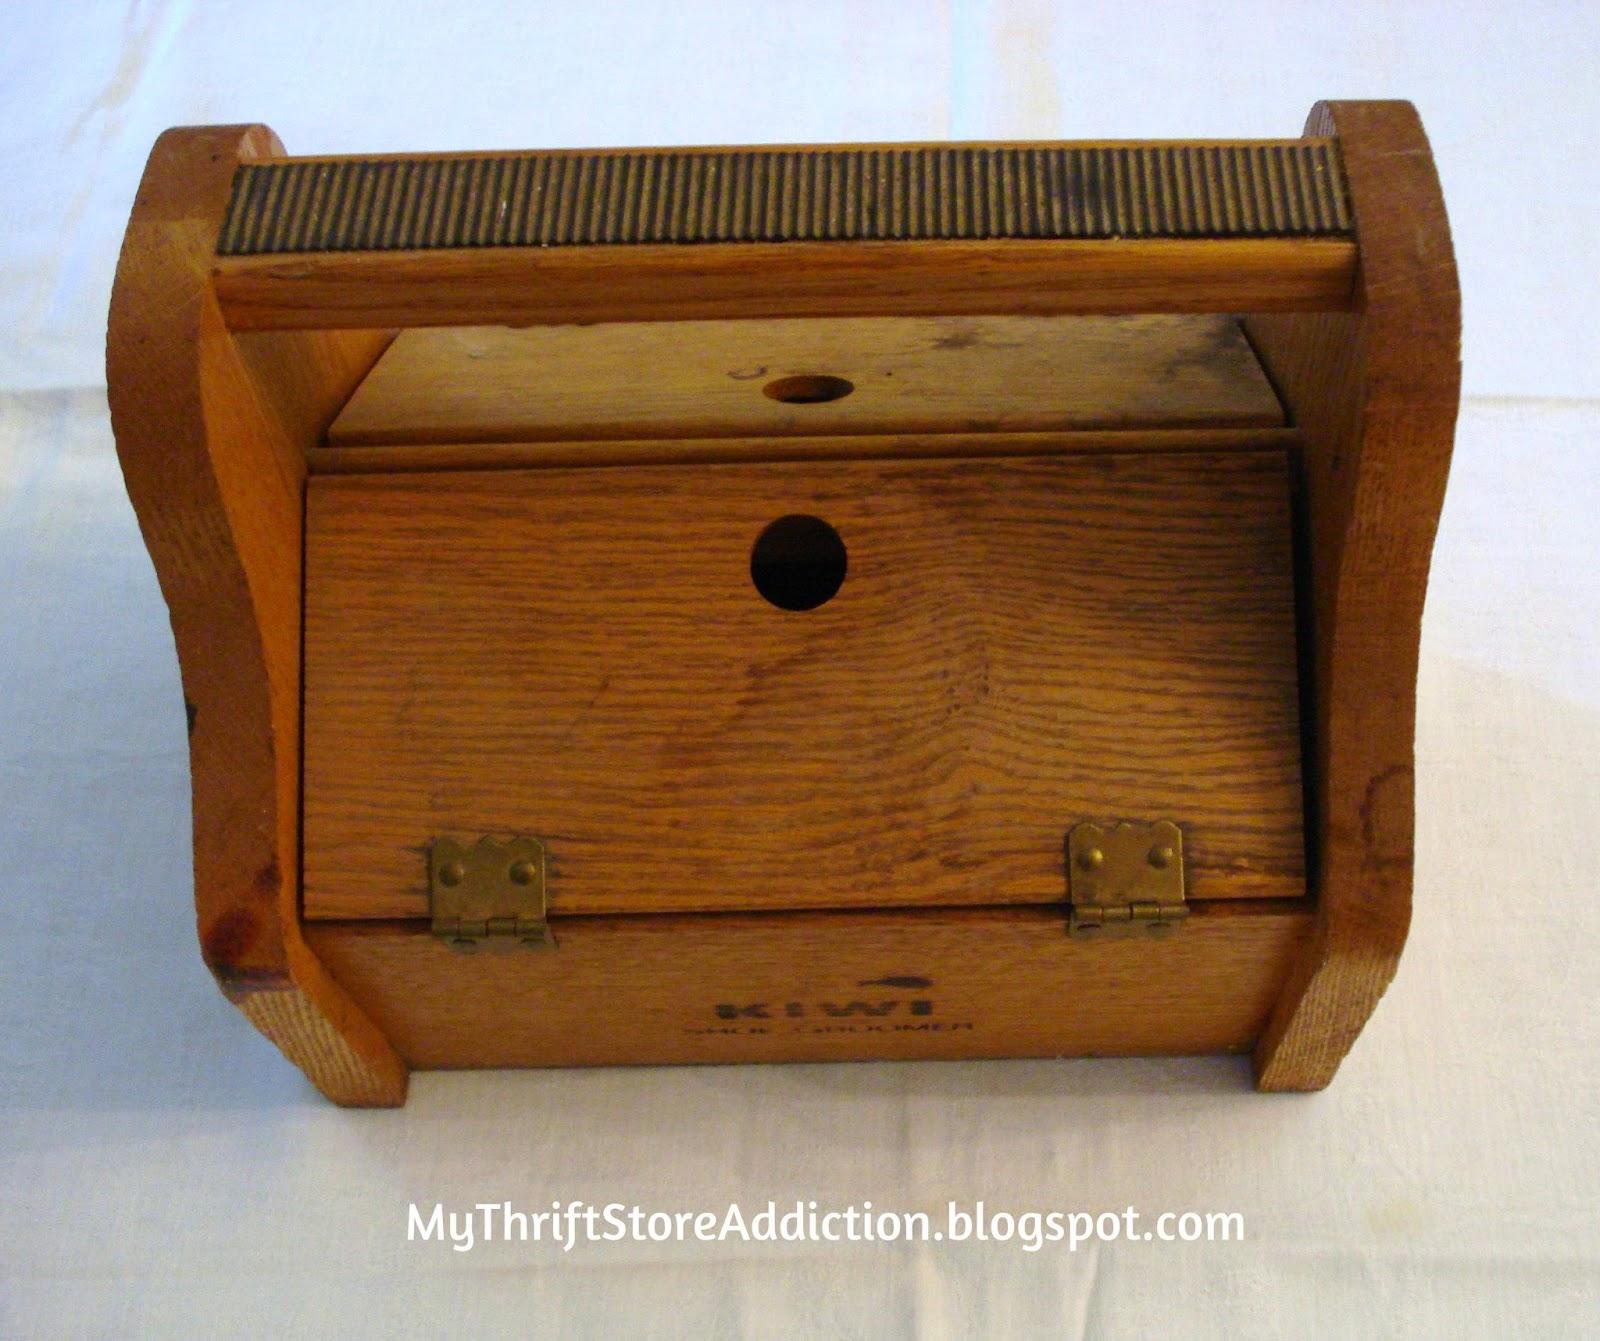 Repurposed vintage shoe shine box